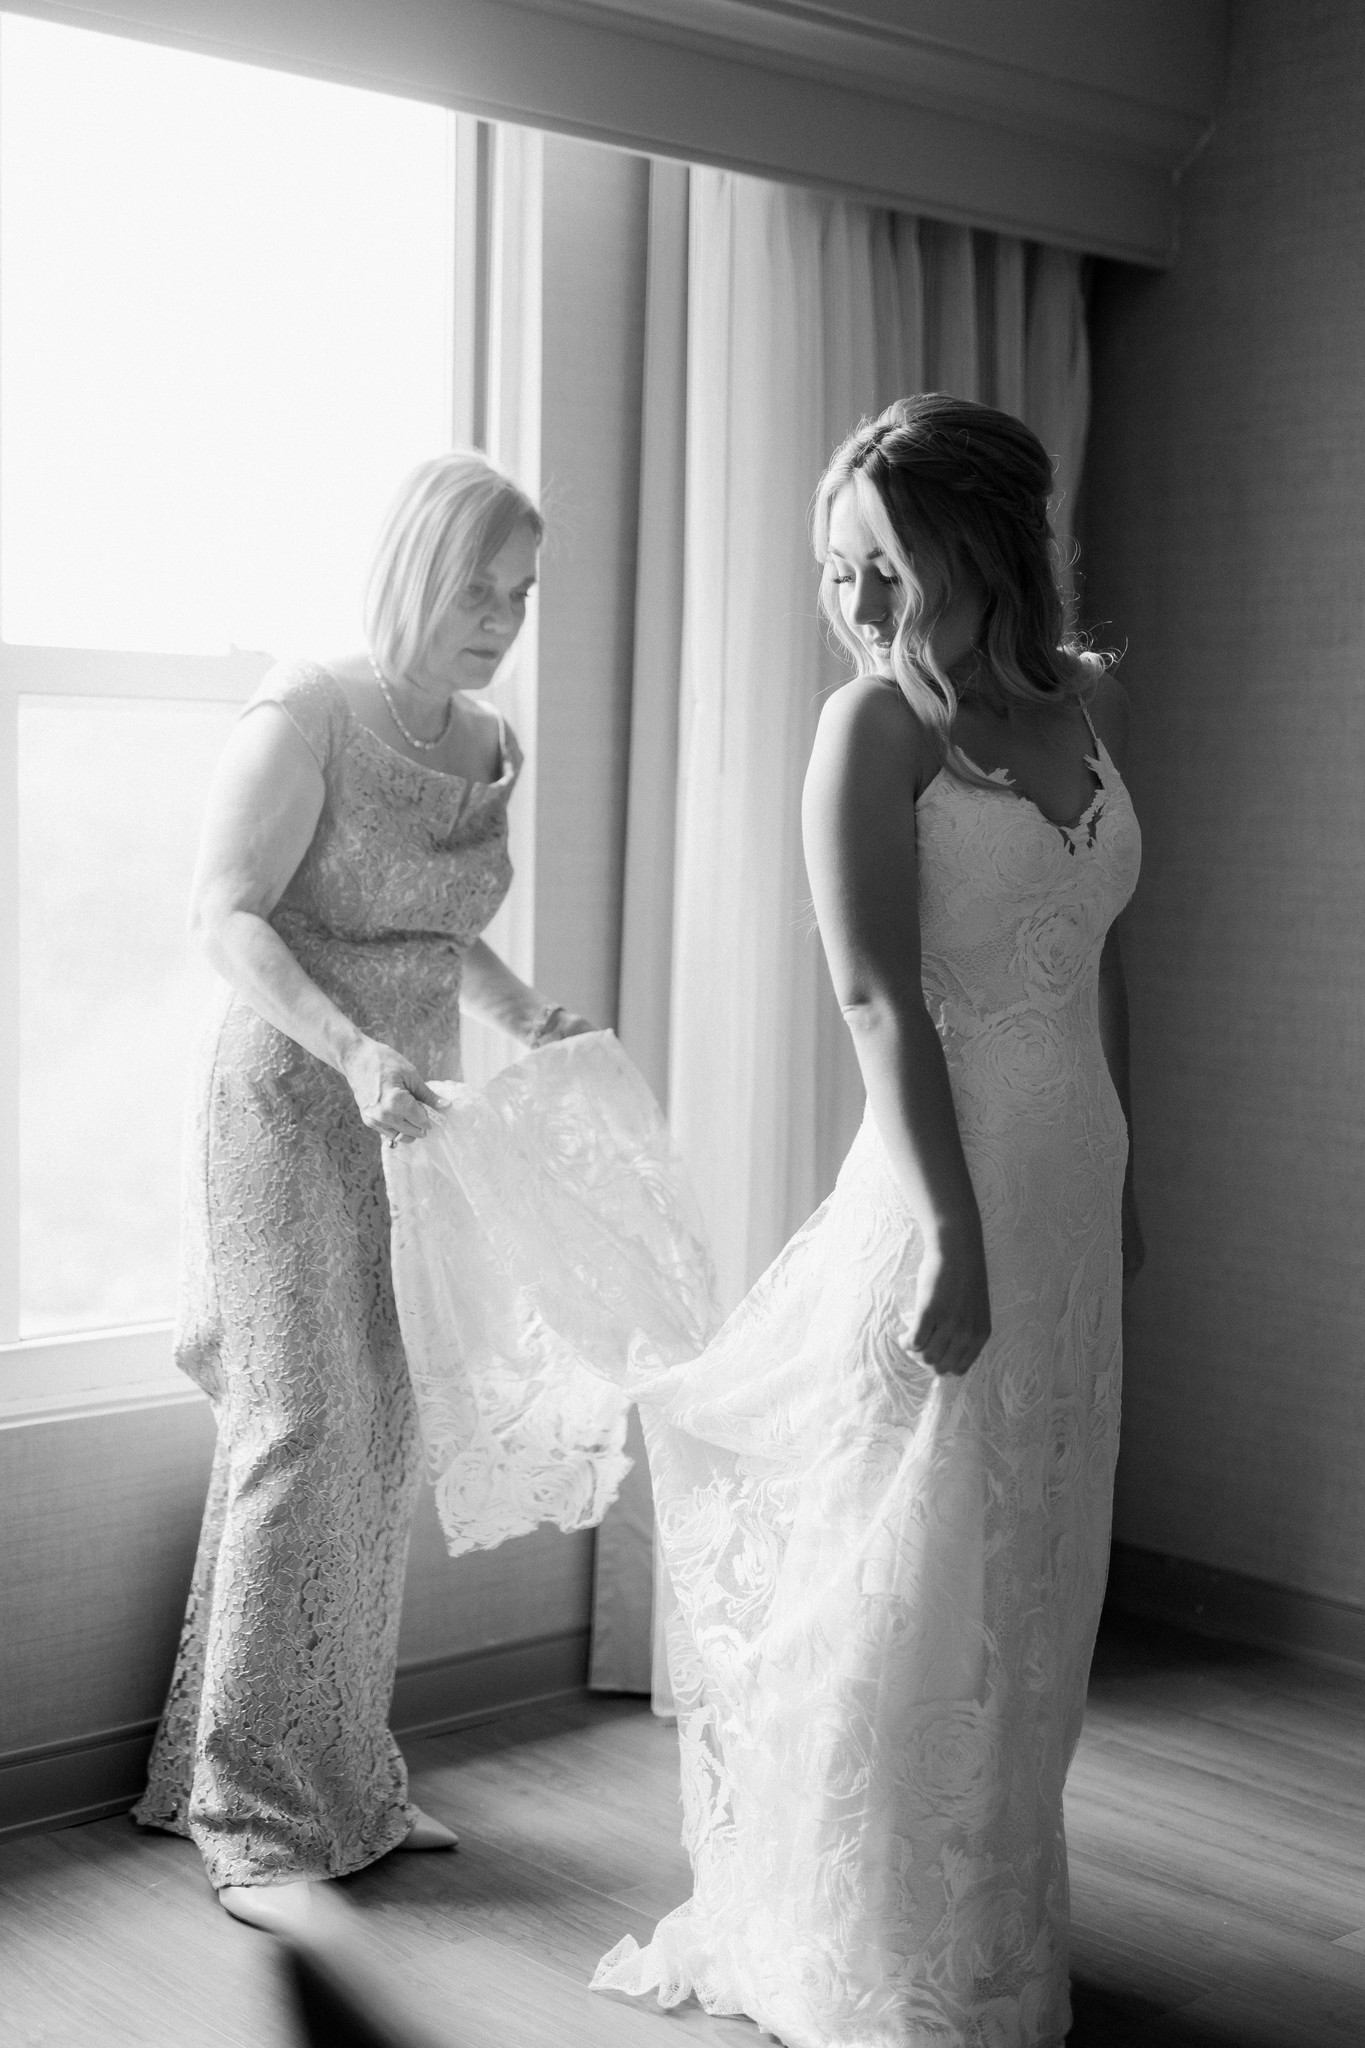 black and white wedding photos__ct wedding_ct wedding photographer-2_Easy-Resize.com.jpg